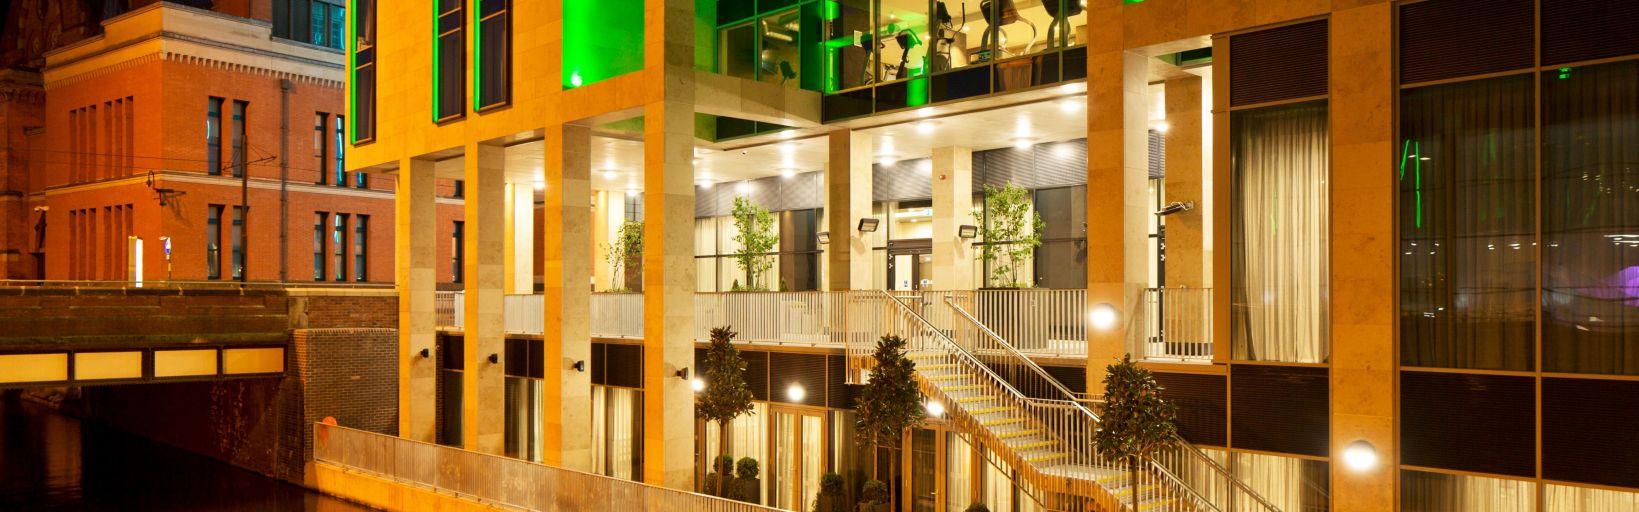 best dating greek manchester city centre hotels